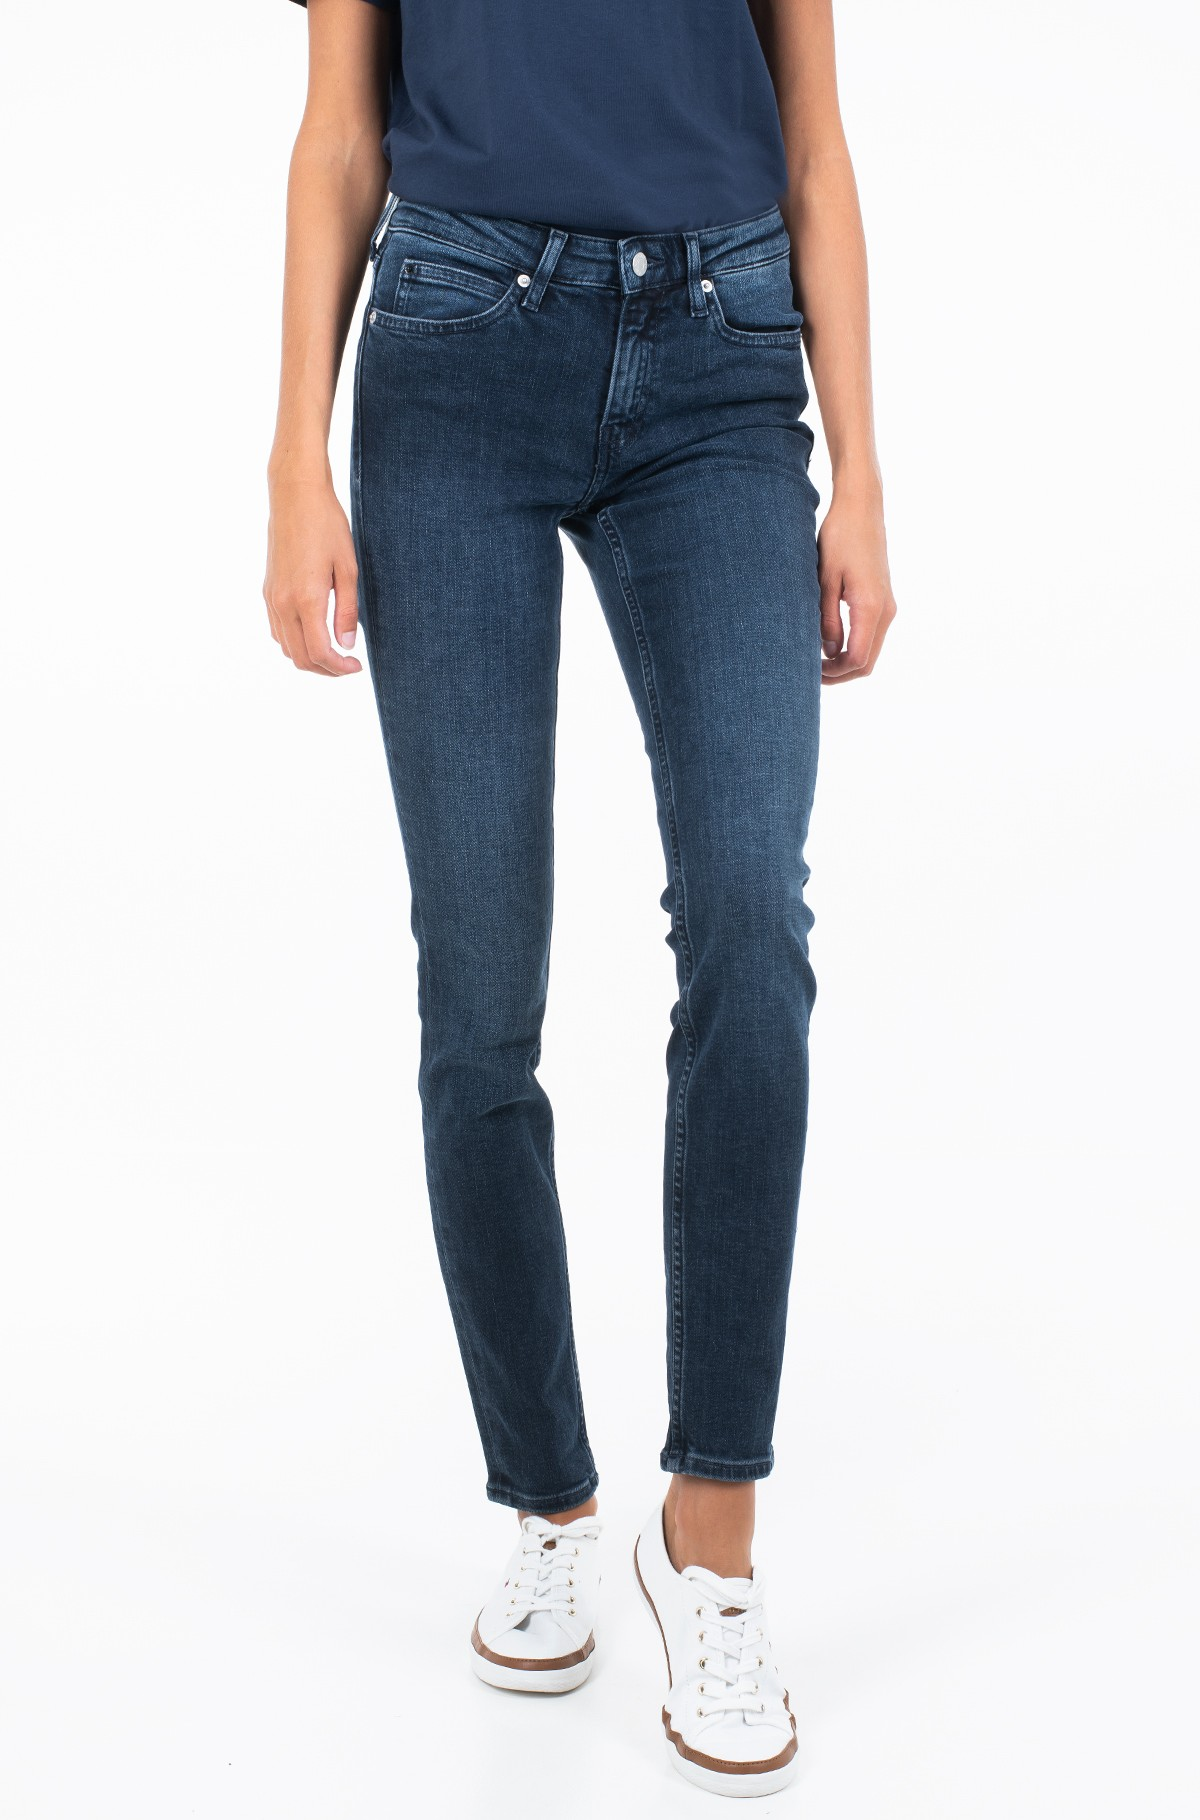 Jeans CKJ 011 MID RISE SKINNY J20J211392-full-1